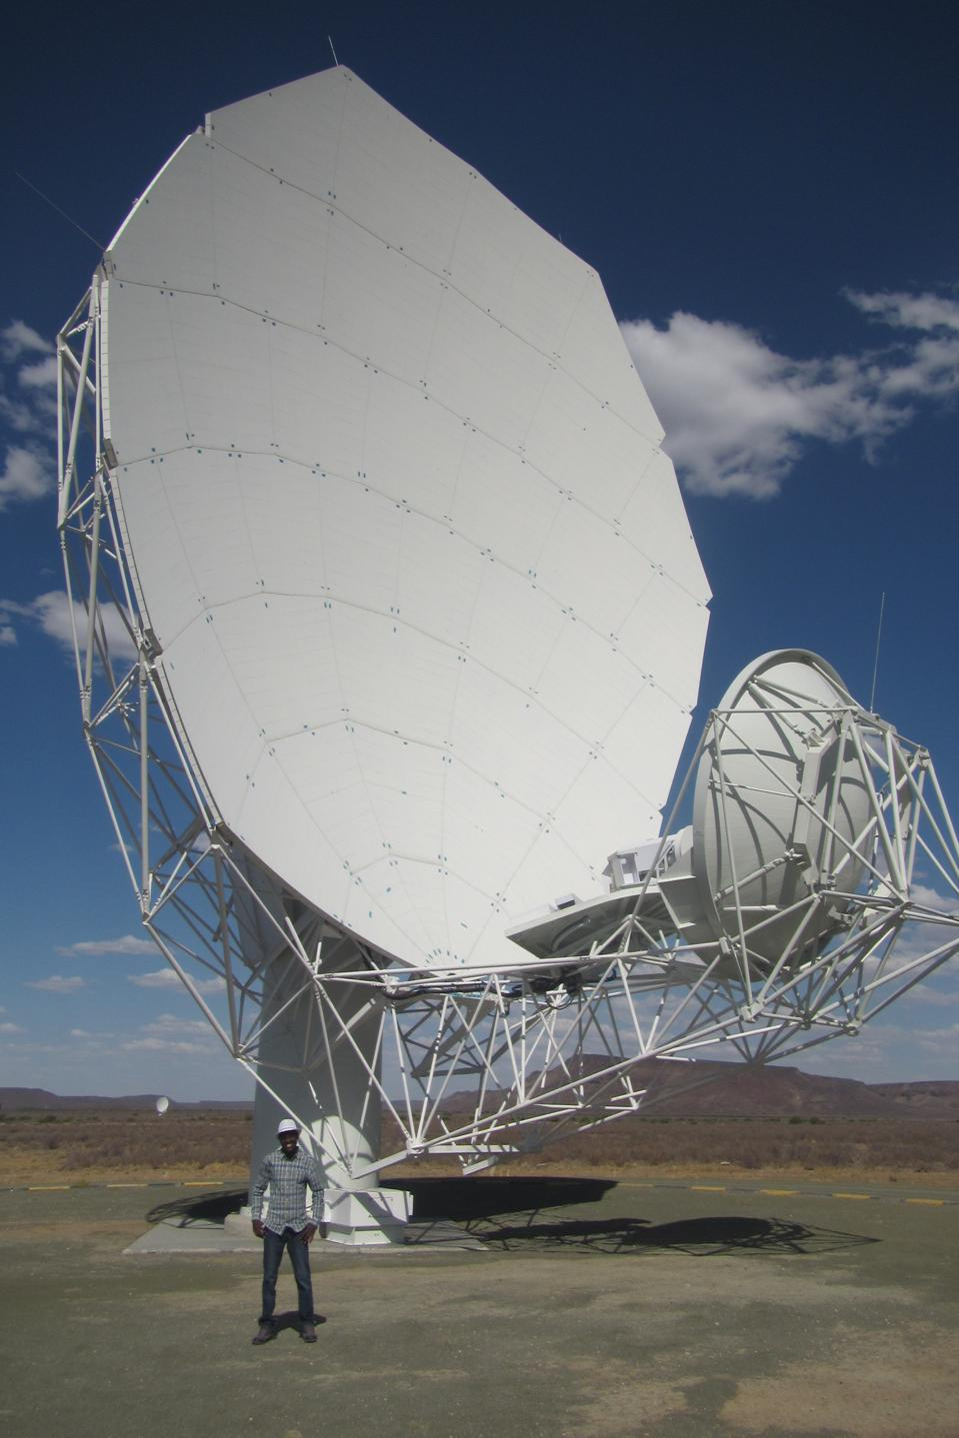 El astrónomo sudanés Abu Bakr Ibrahim frente al radiotelescopio Mirkat.